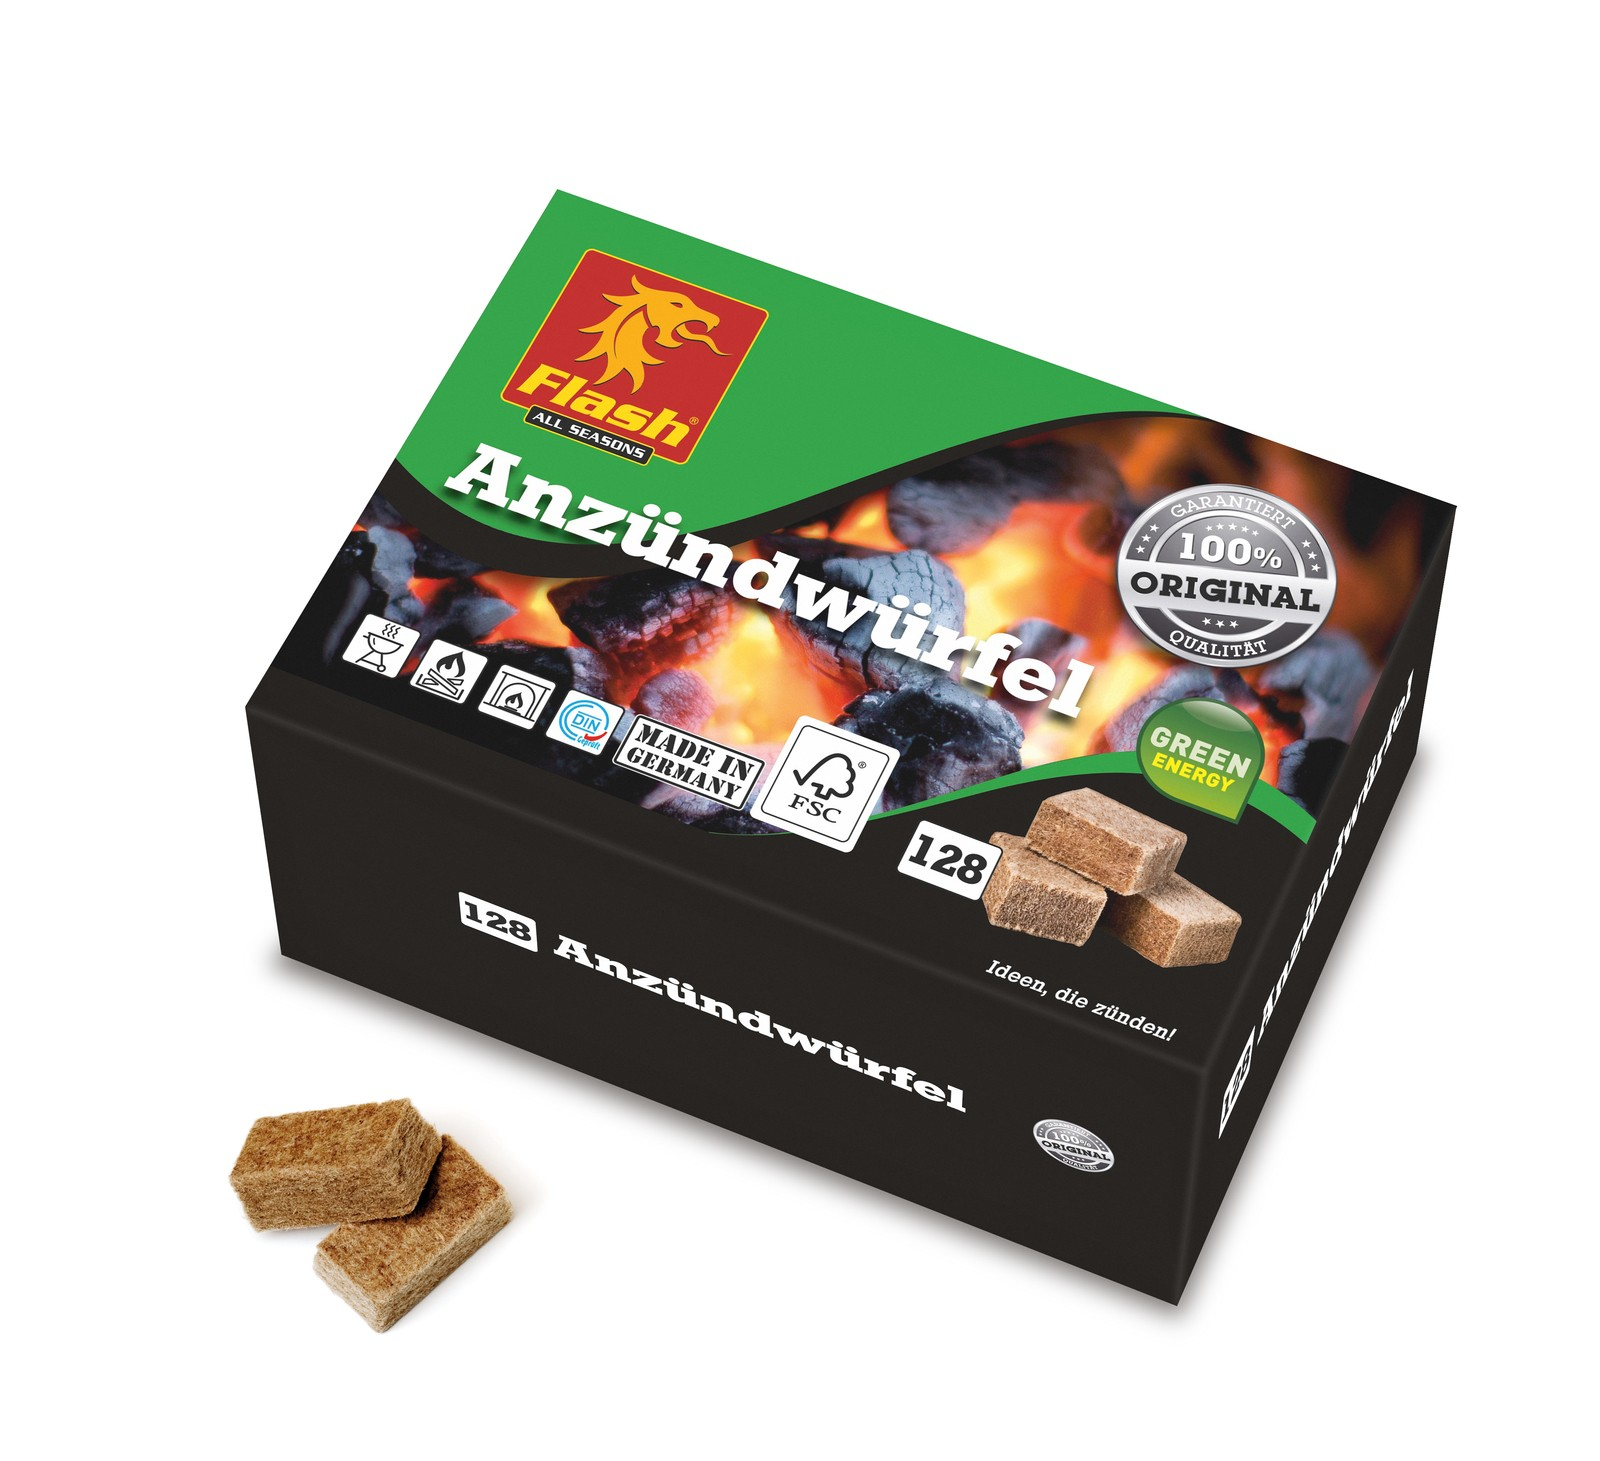 FLASH Anzünder Holz & Wachs 128 Würfel